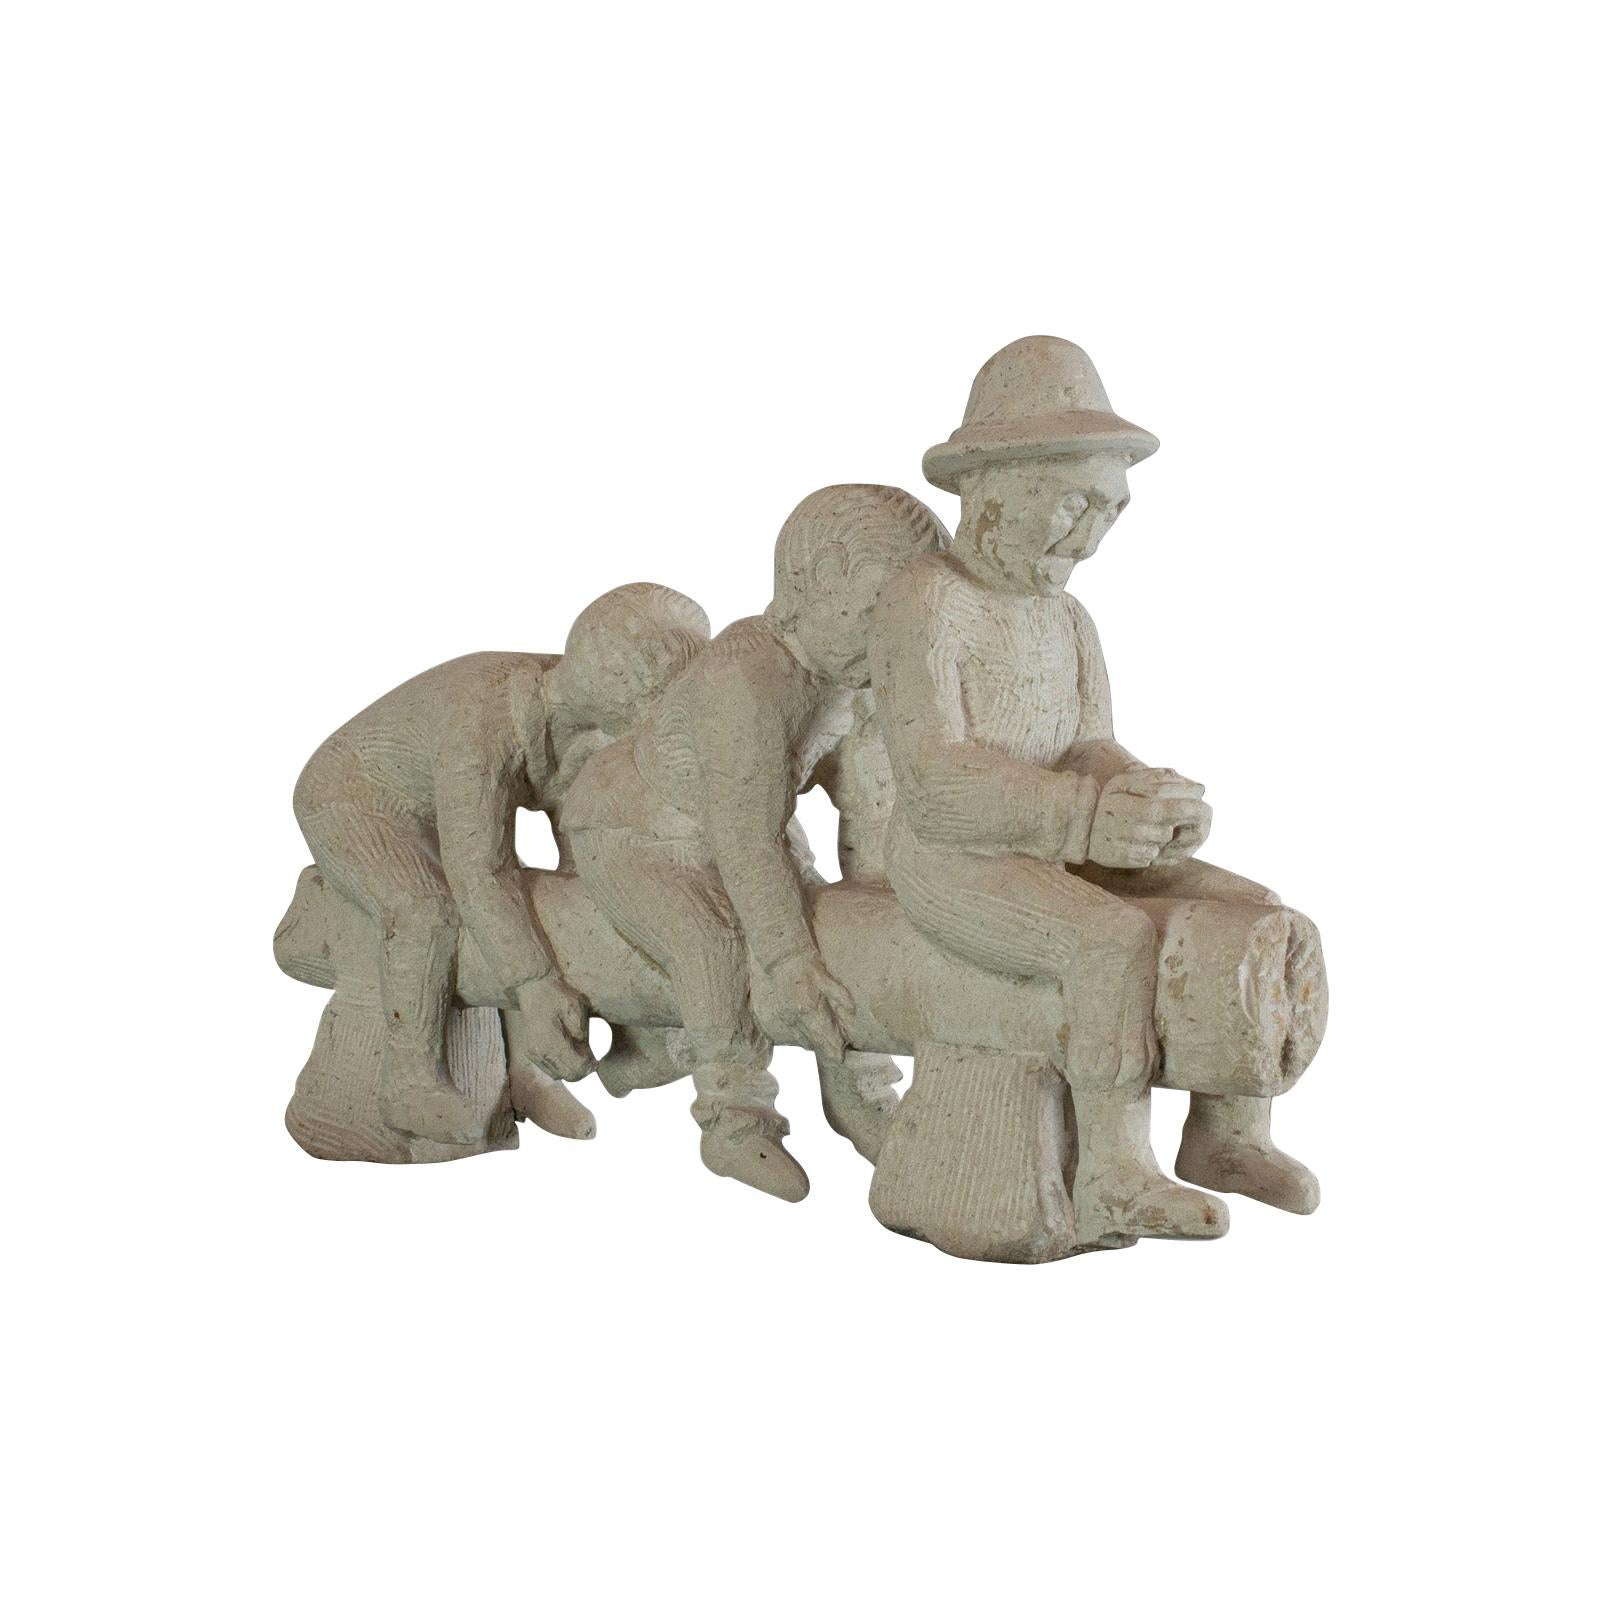 No Evil, Sculptural Artwork, Sculpture, Dominic Hurley, Portland Stone, Allegory